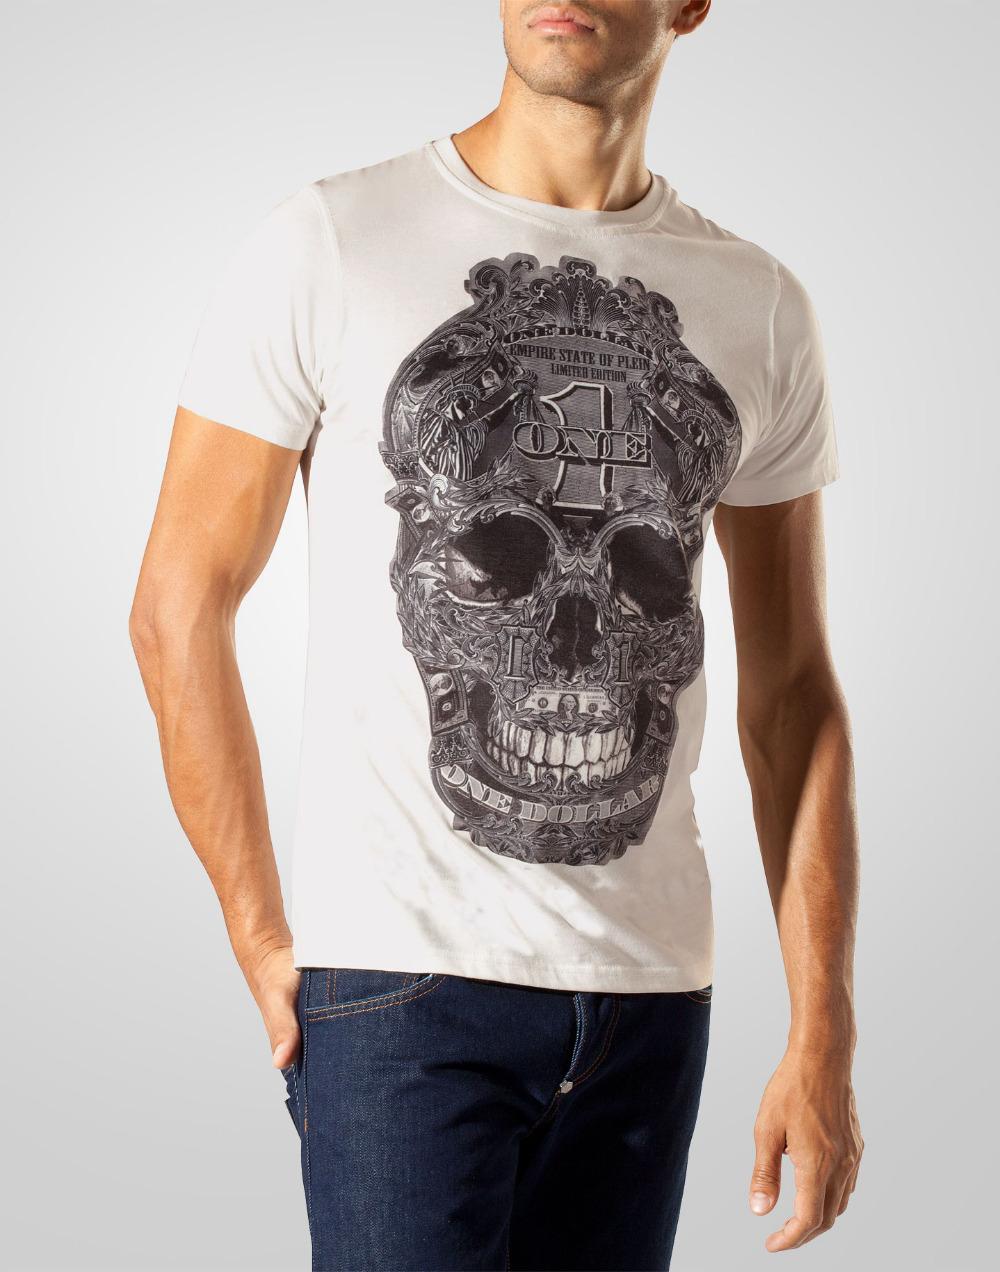 Mens summer brand t shirt 2016 fashion men short tee 3d for 6 dollar shirts coupon code free shipping